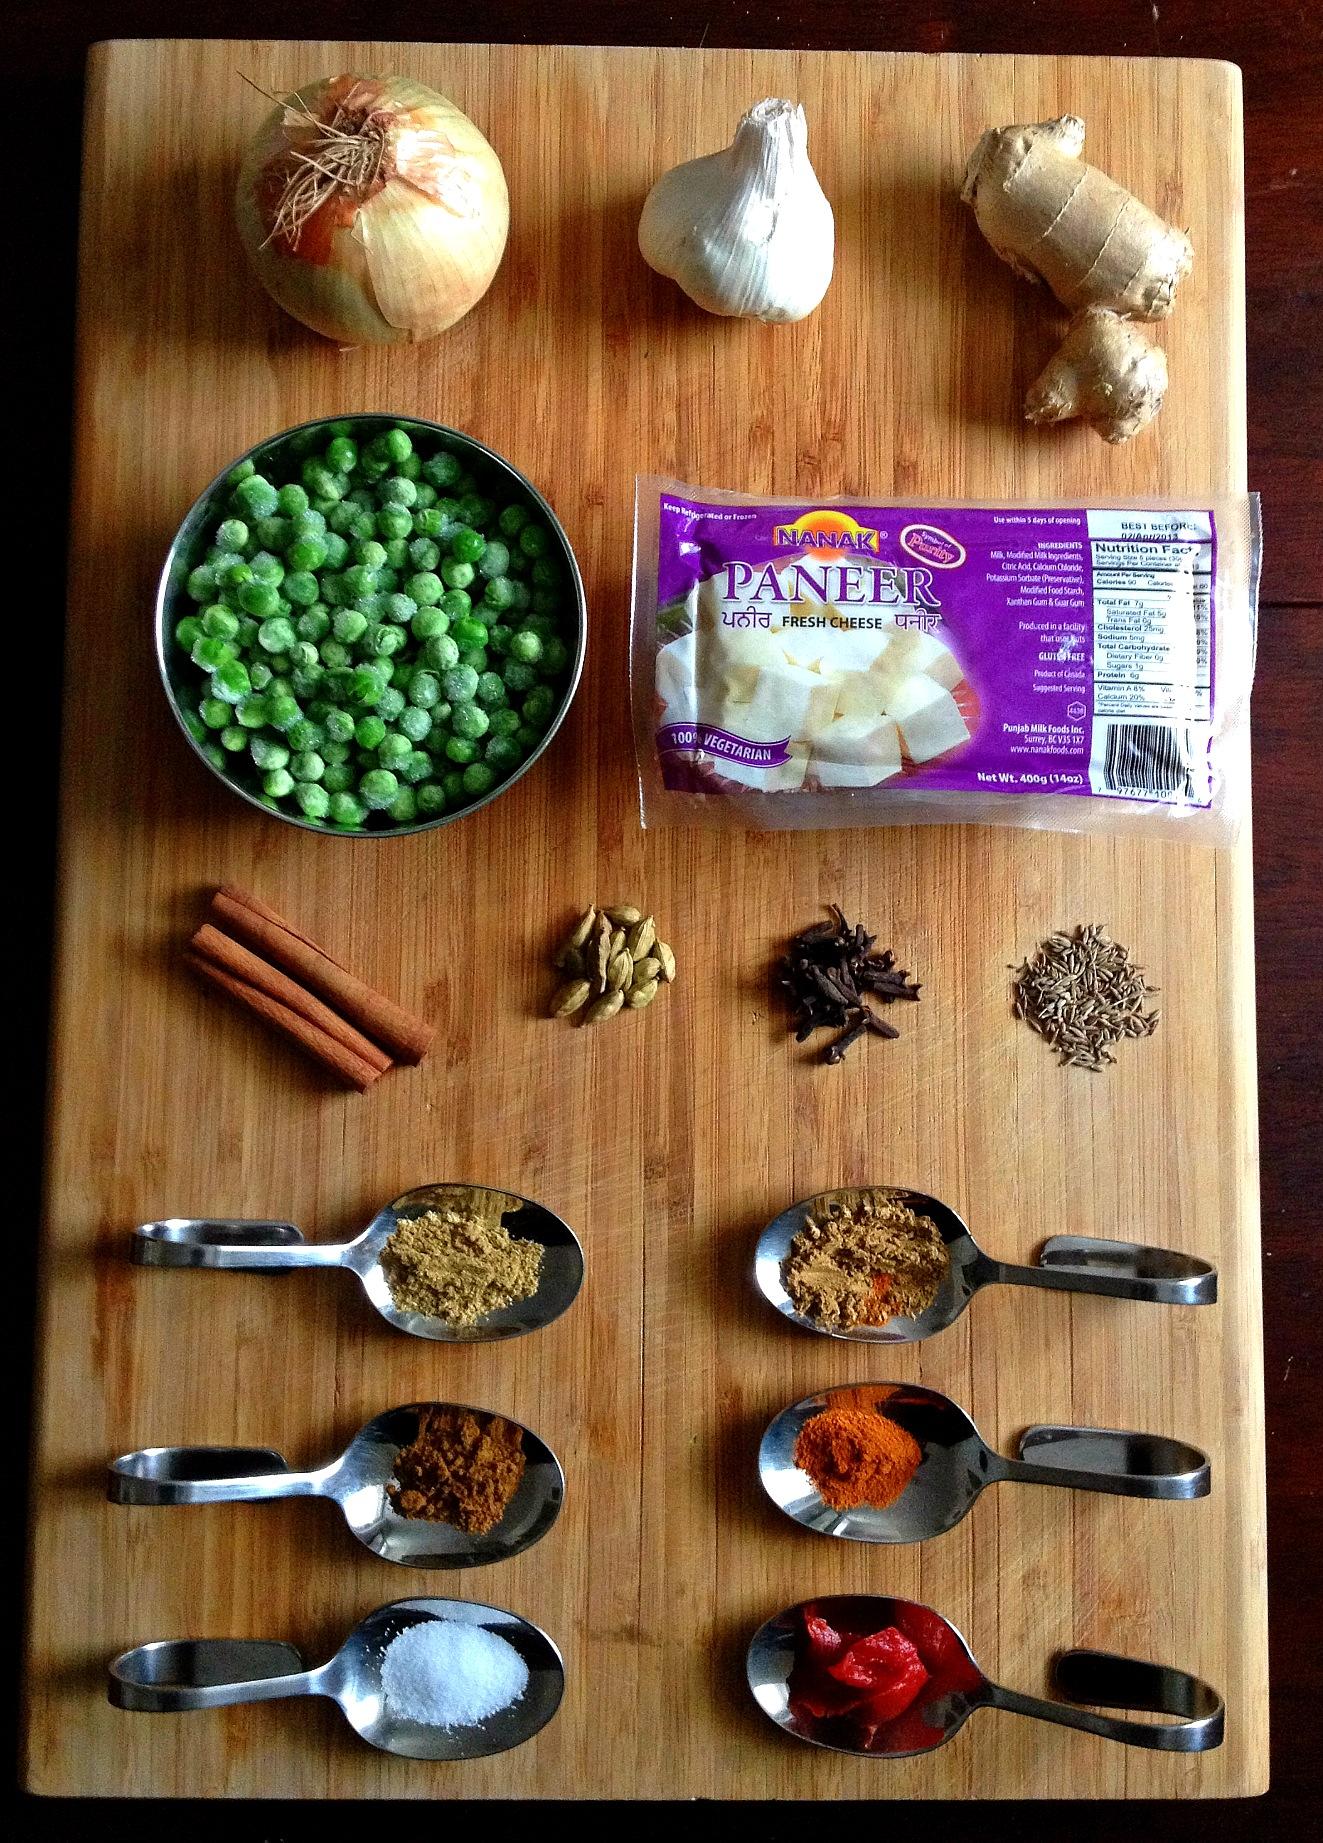 Ingredients for Mattar Paneer